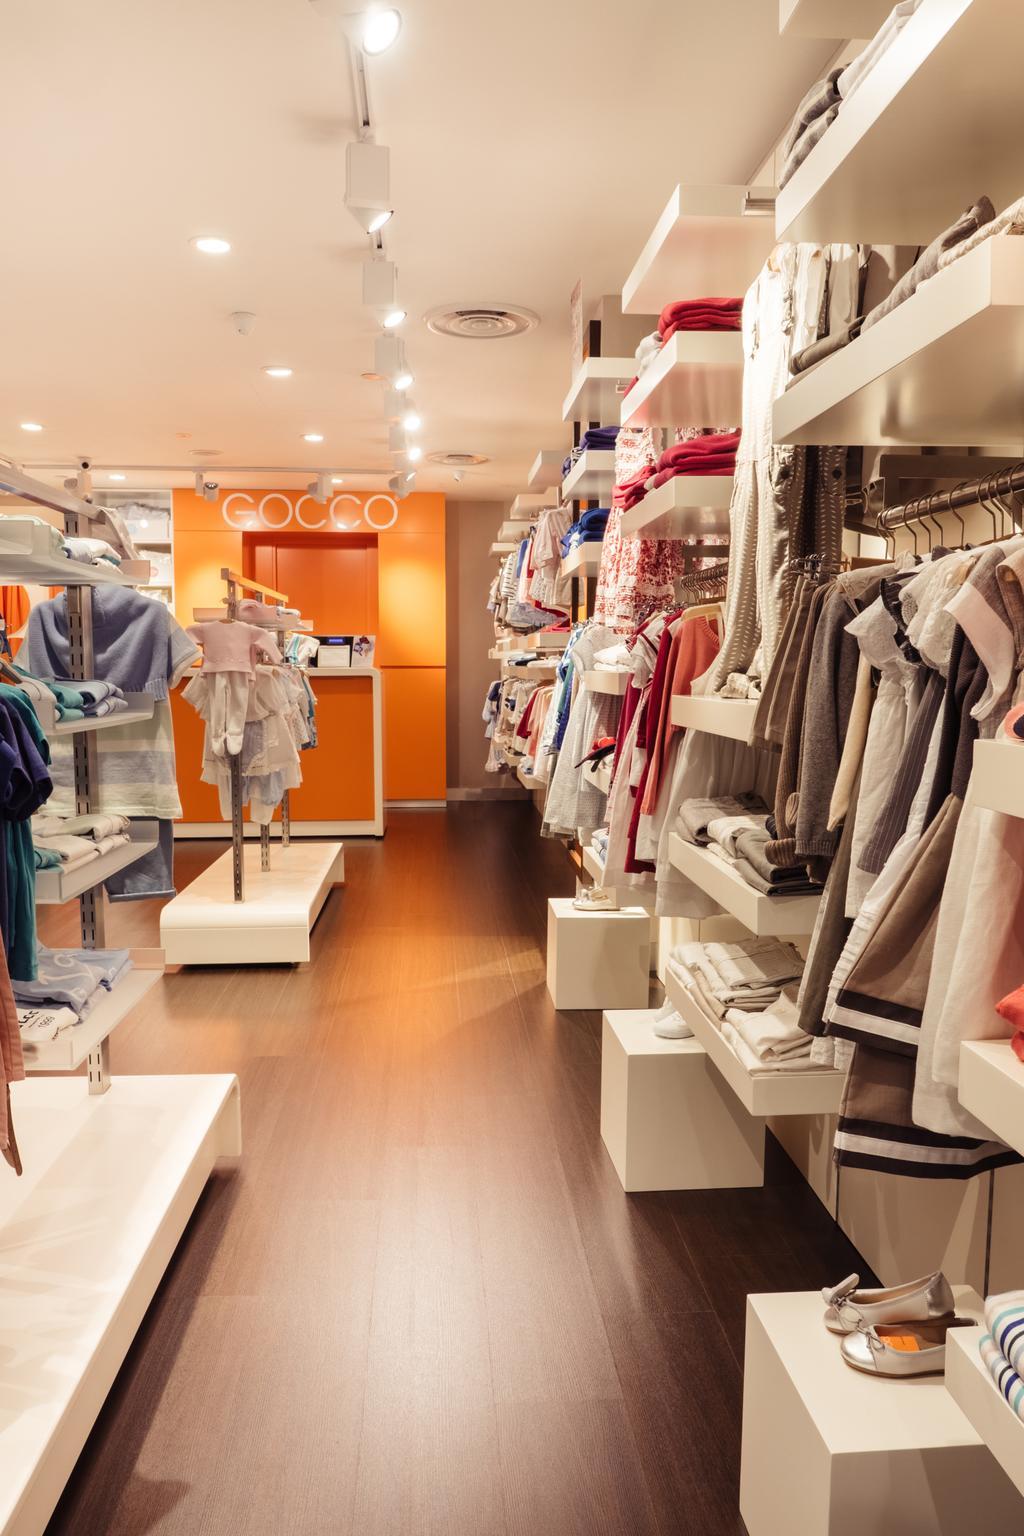 Gocco, Commercial, Interior Designer, Urban Habitat Design, Modern, Human, People, Person, Closet, Apparel, Clothing